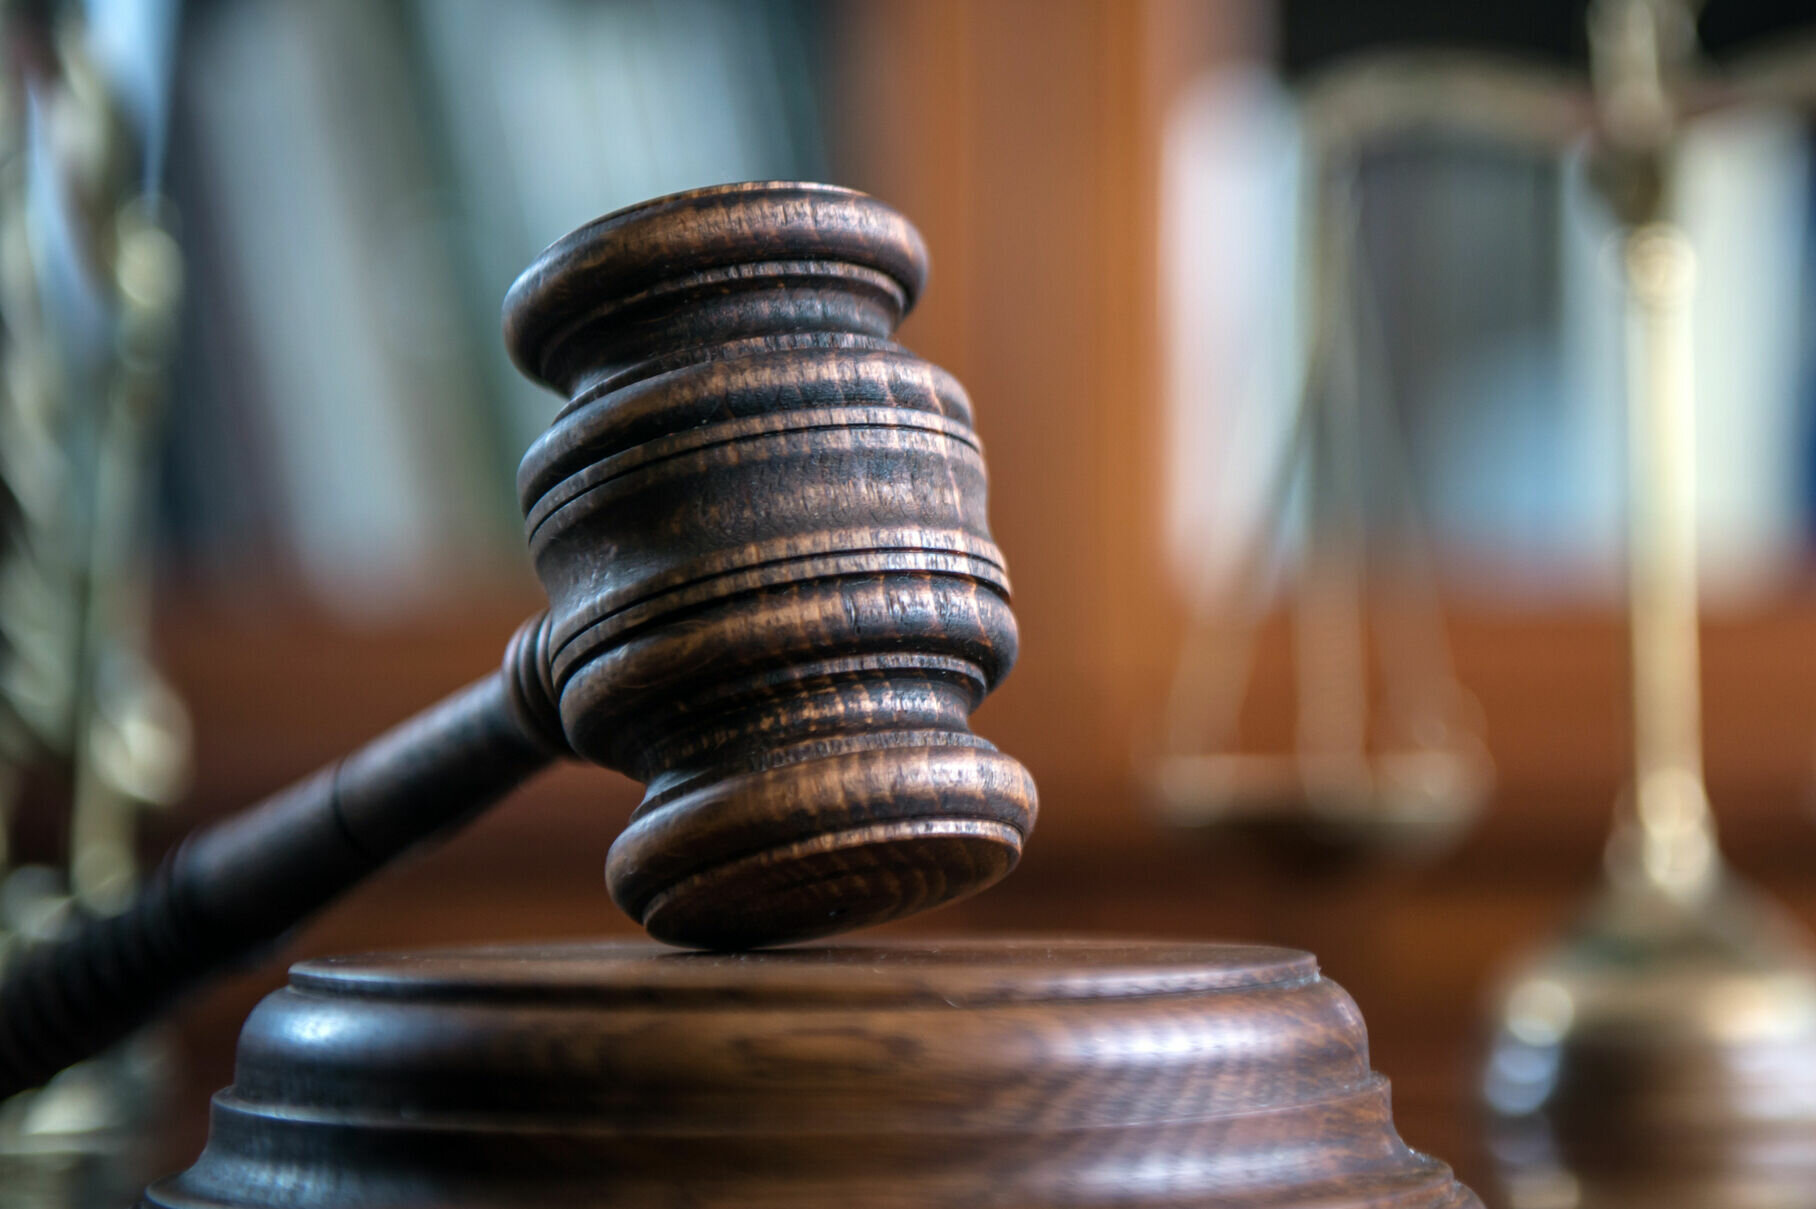 Officials free Va. man accused of hiring hitman to kill wife